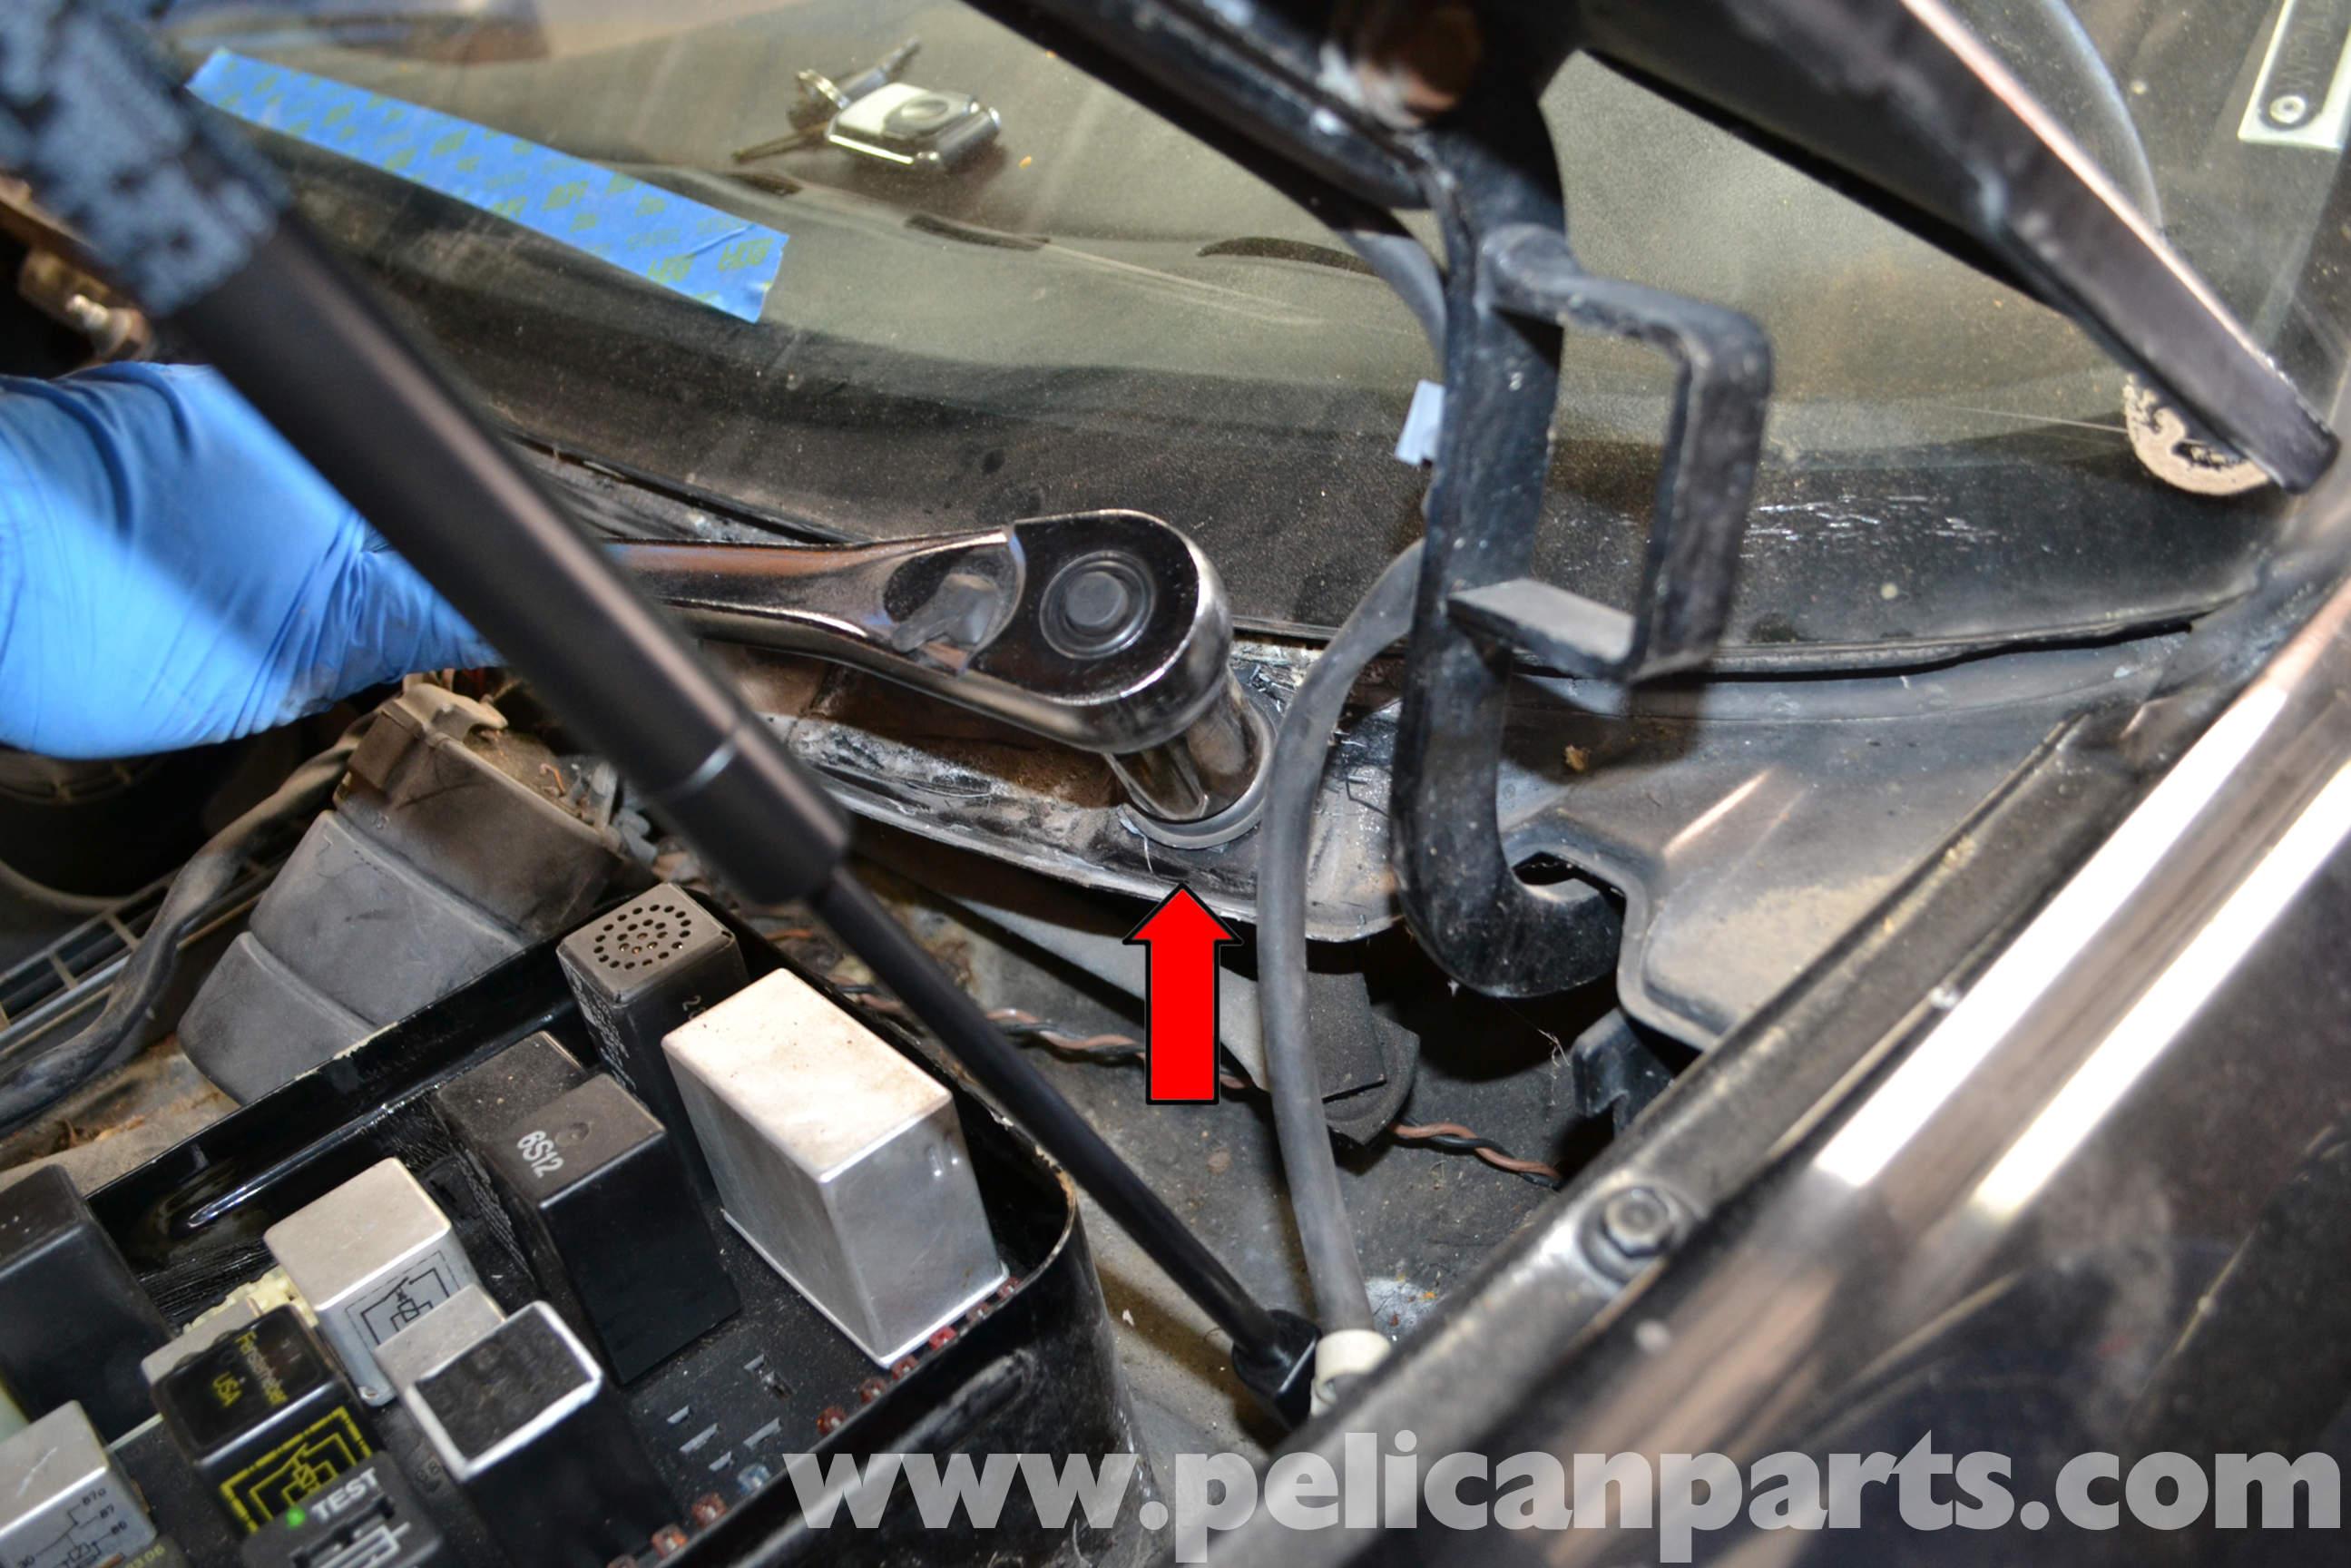 Pelican technical article porsche 944 turbo windshield for Windshield wiper motor parts